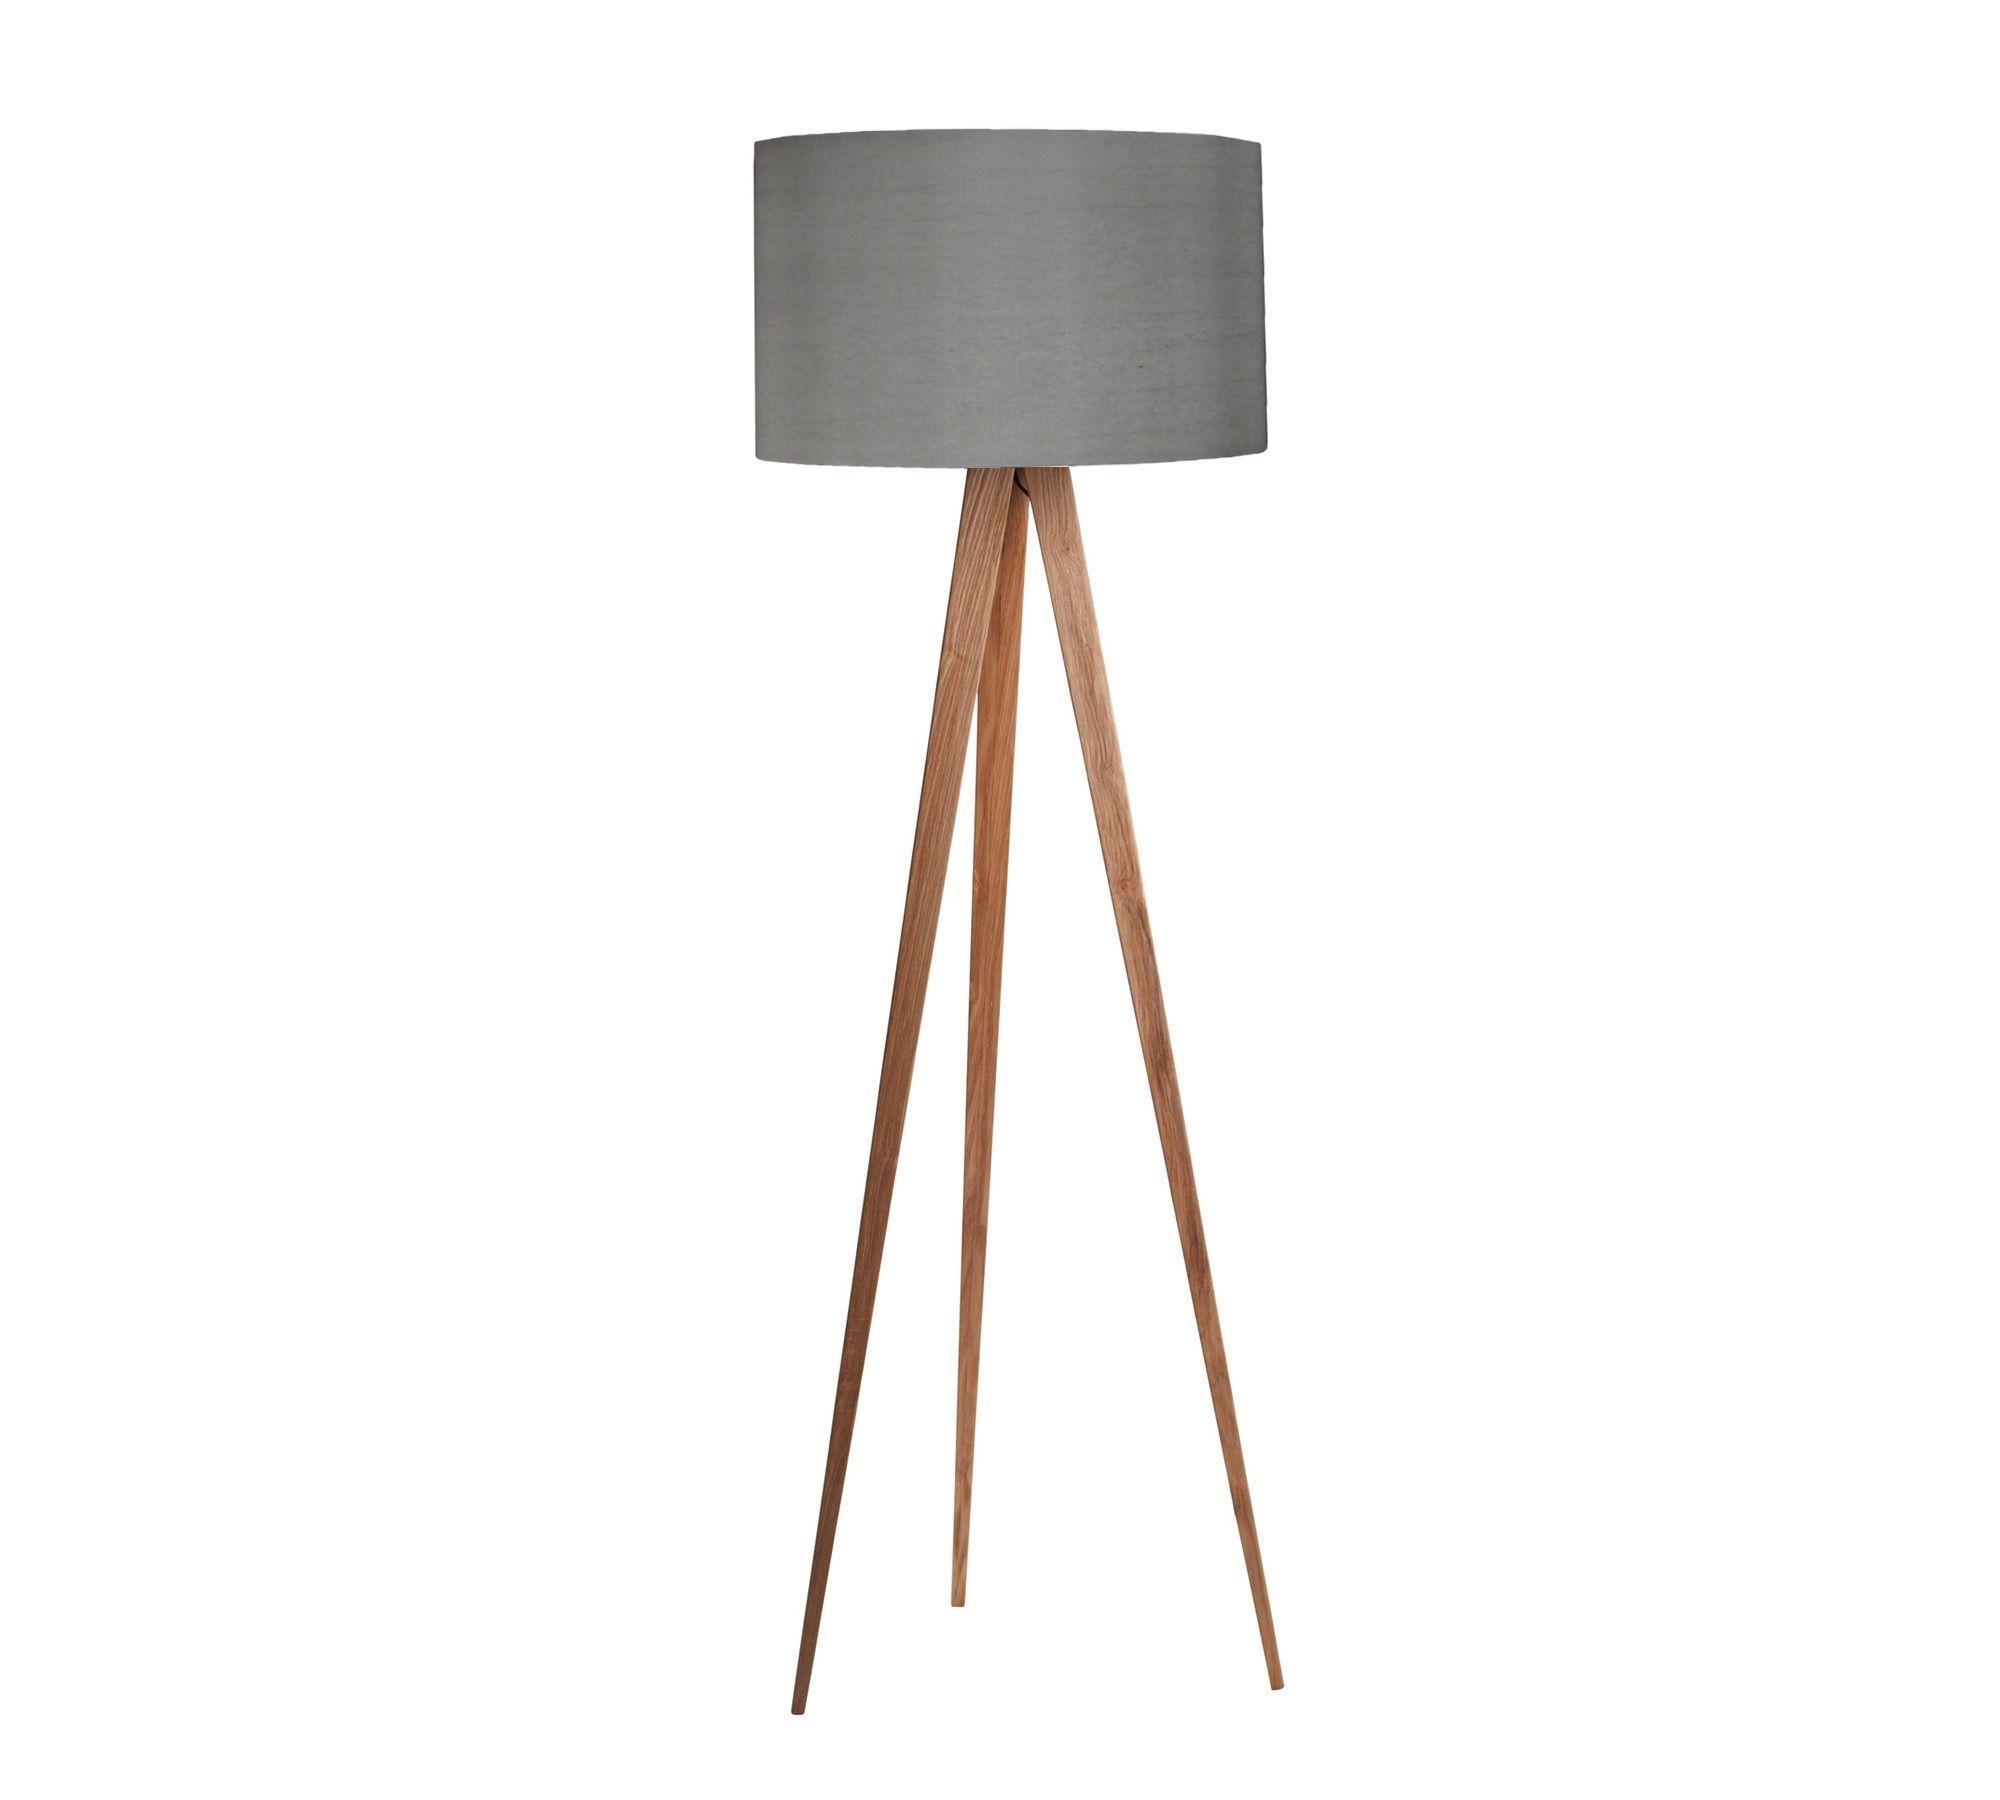 Zuiver stehleuchte tripod wood grau 001 home pinterest grau zuiver stehleuchte tripod wood grau 001 parisarafo Choice Image